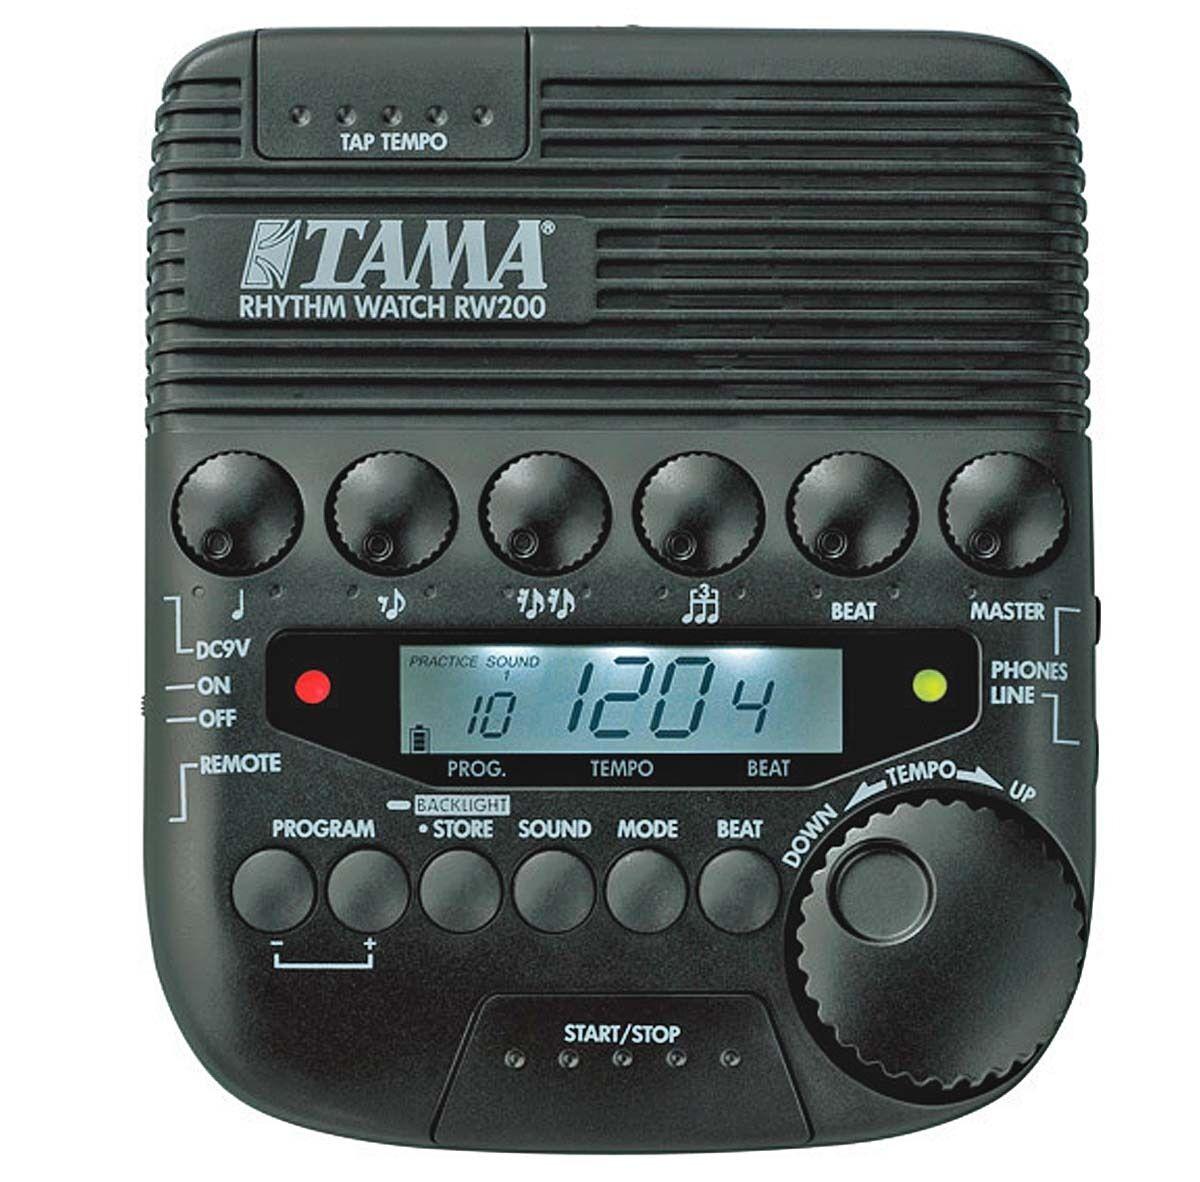 TAMA RW200 Rhythm Watch Metronom RW 200